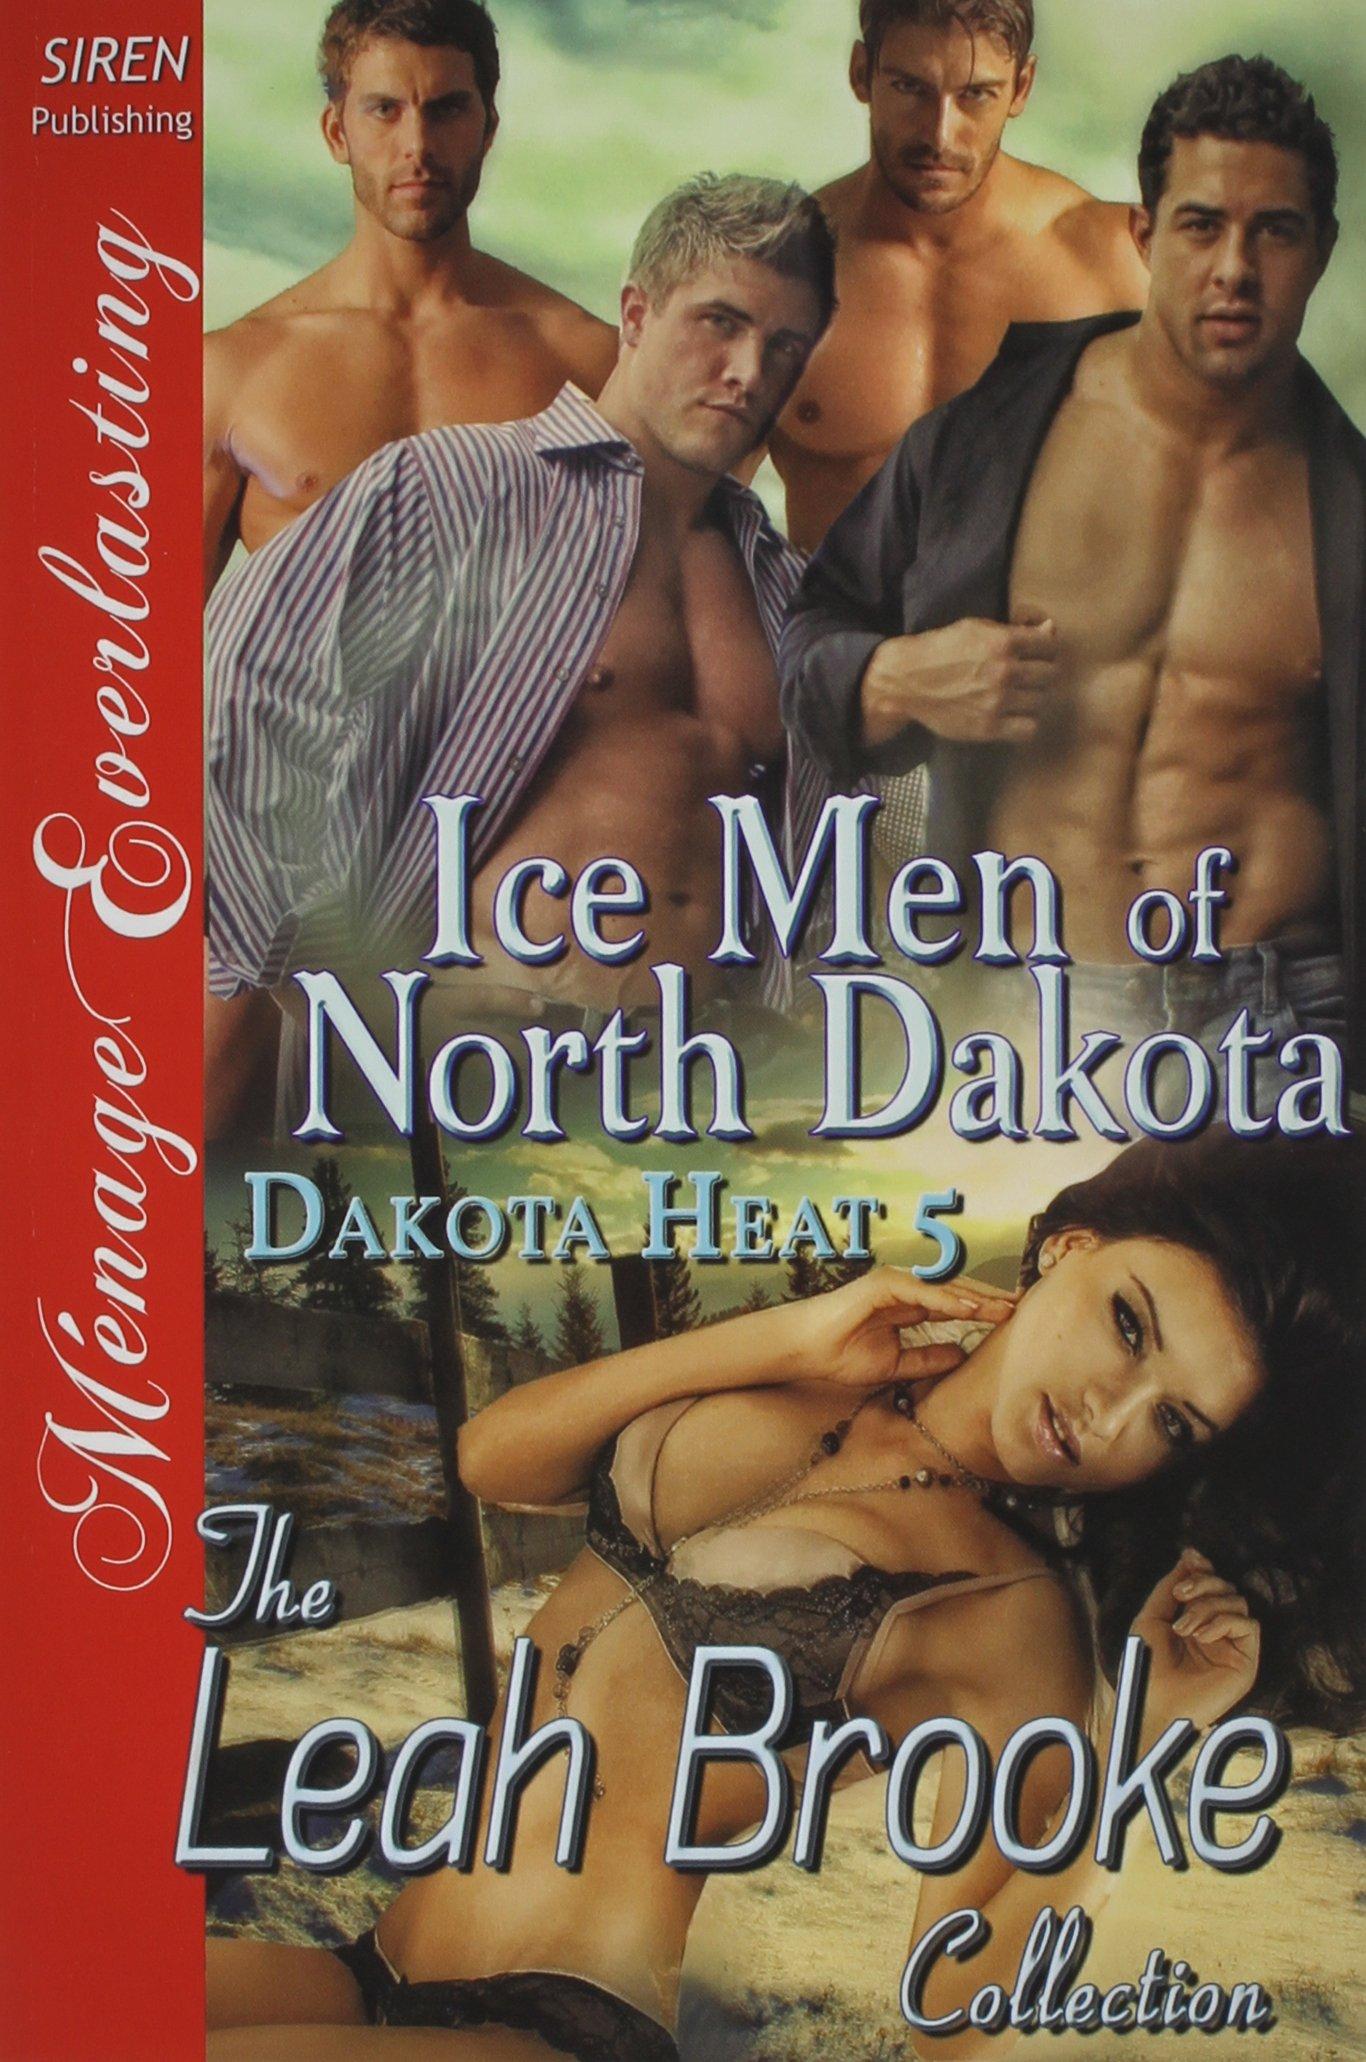 Ice Men of North Dakota [Dakota Heat 5] (Siren Publishing Menage Everlasting) pdf